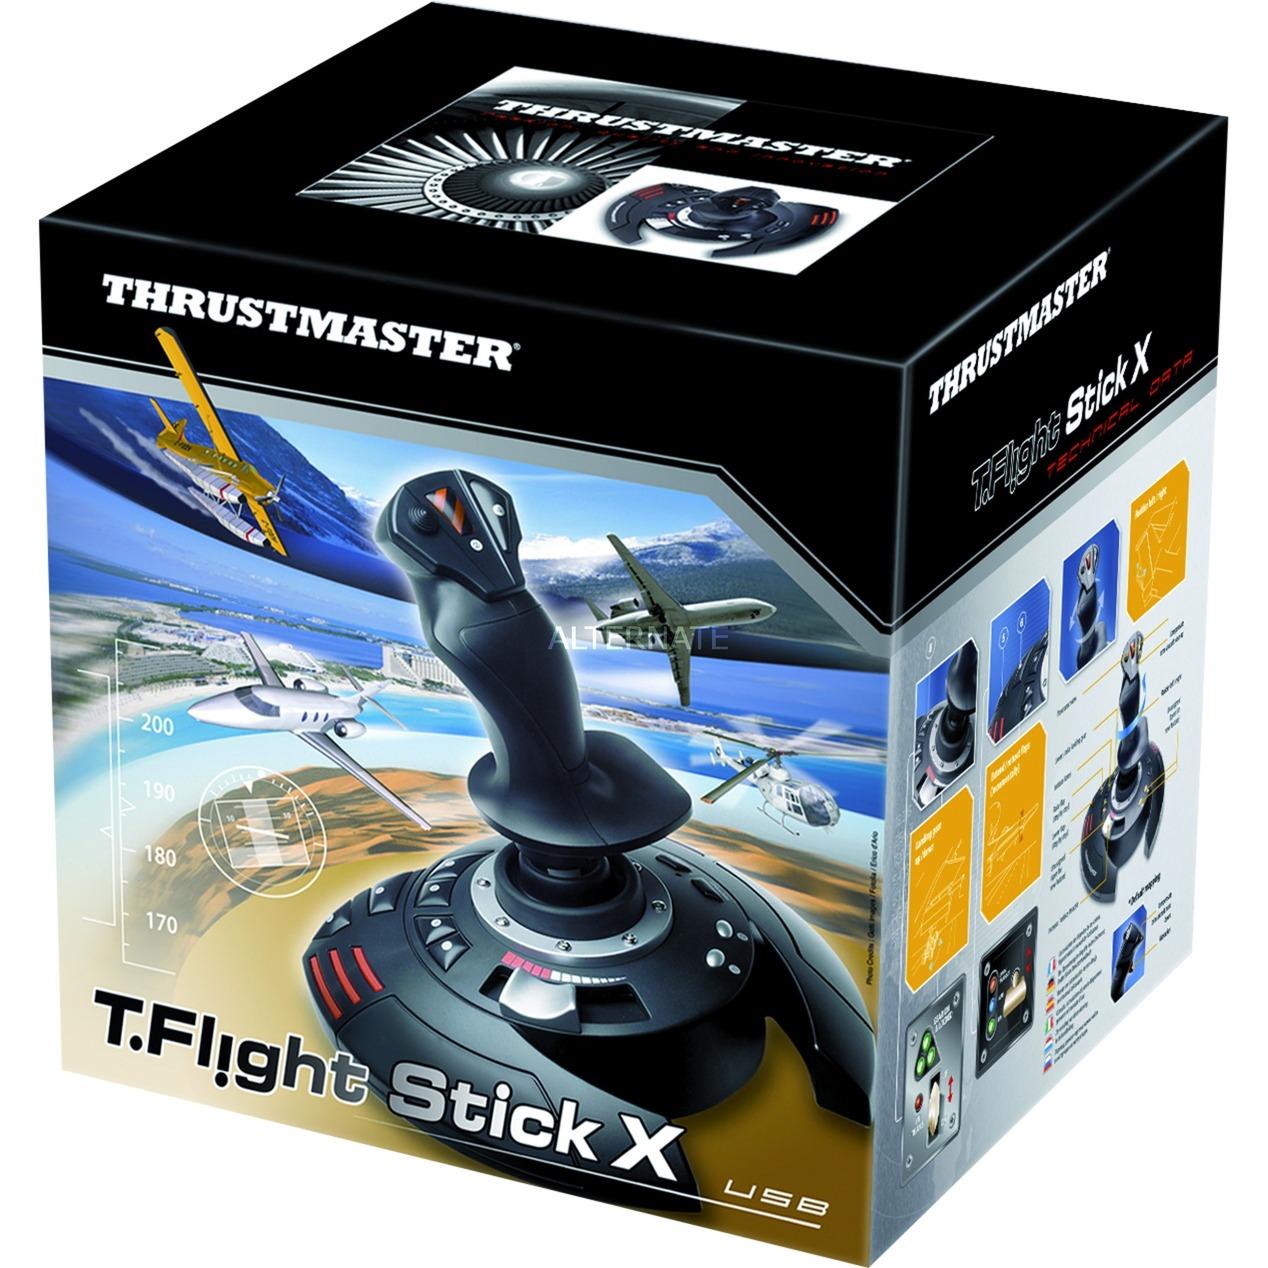 T.Flight Stick X Palanca de mando Playstation 3 Negro